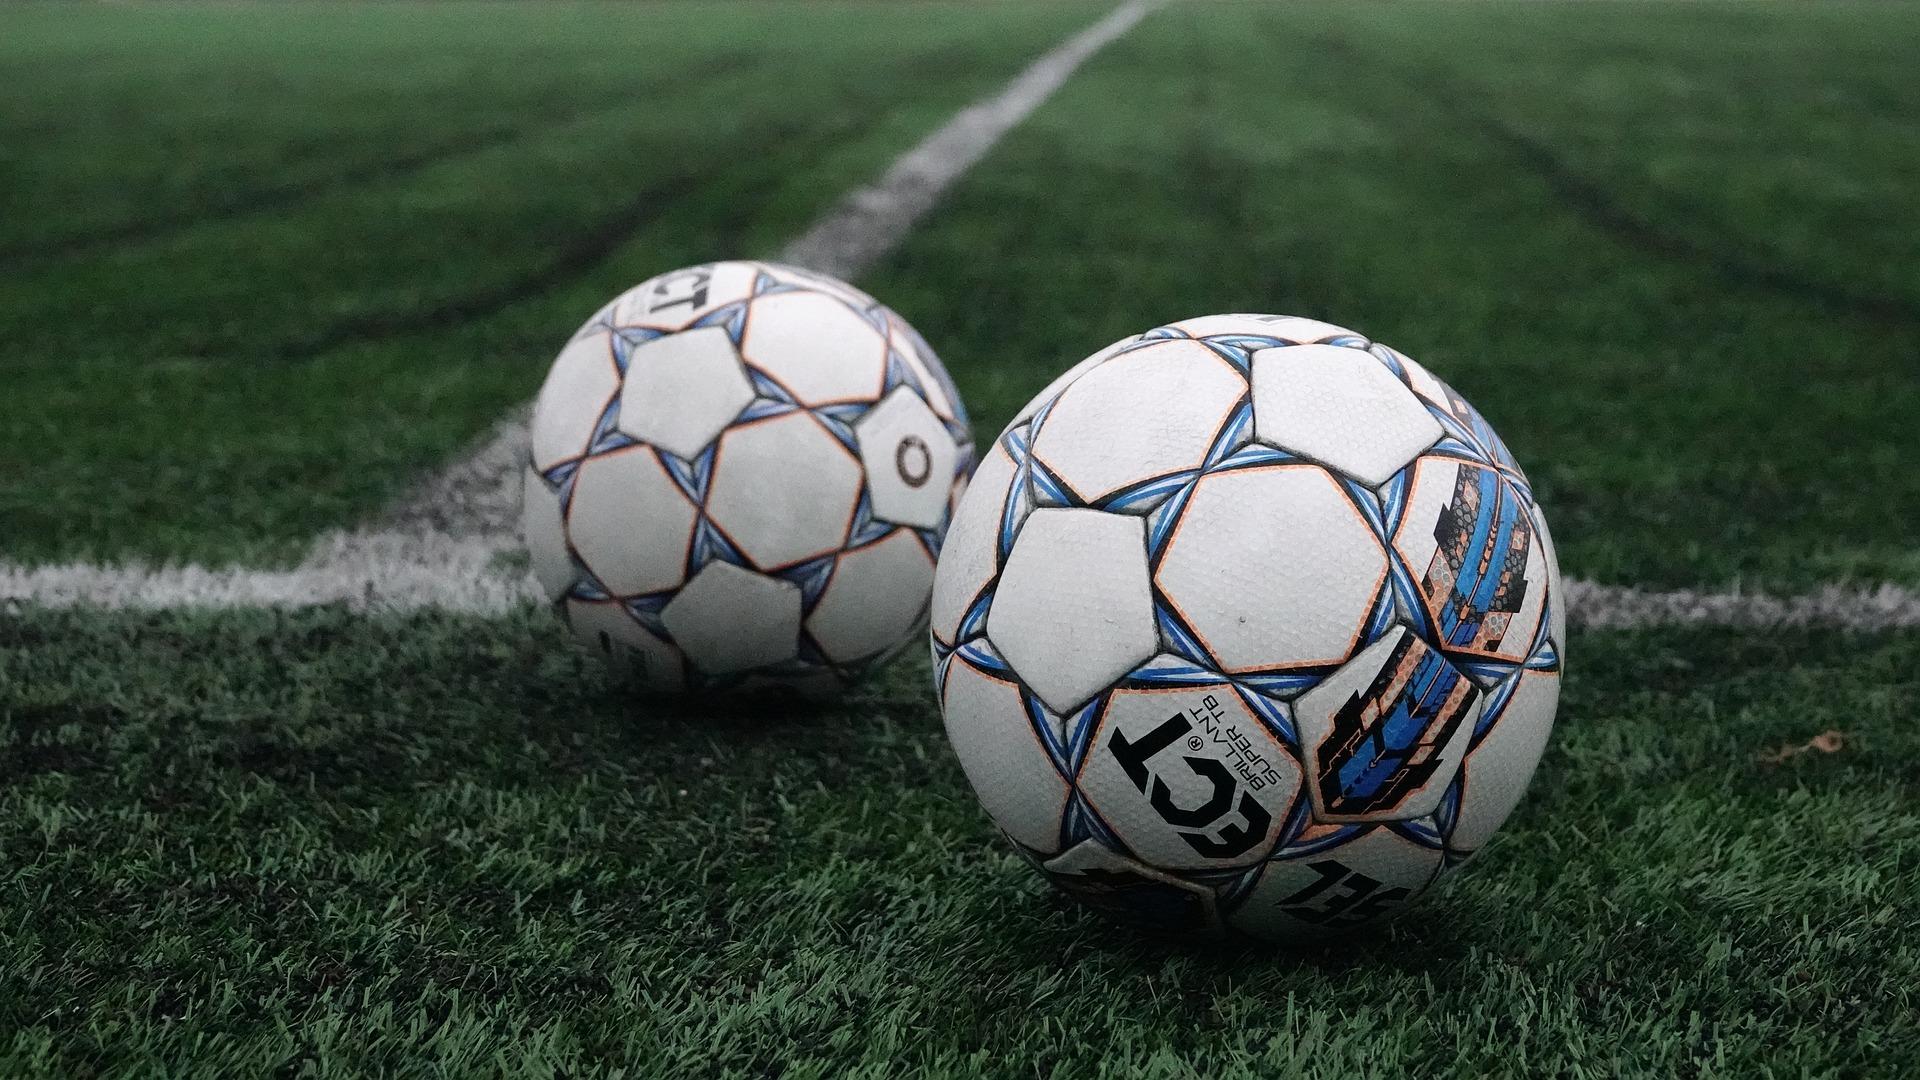 Voorlopige teamindeling senioren VC Trynwâlden seizoen 2021/2022